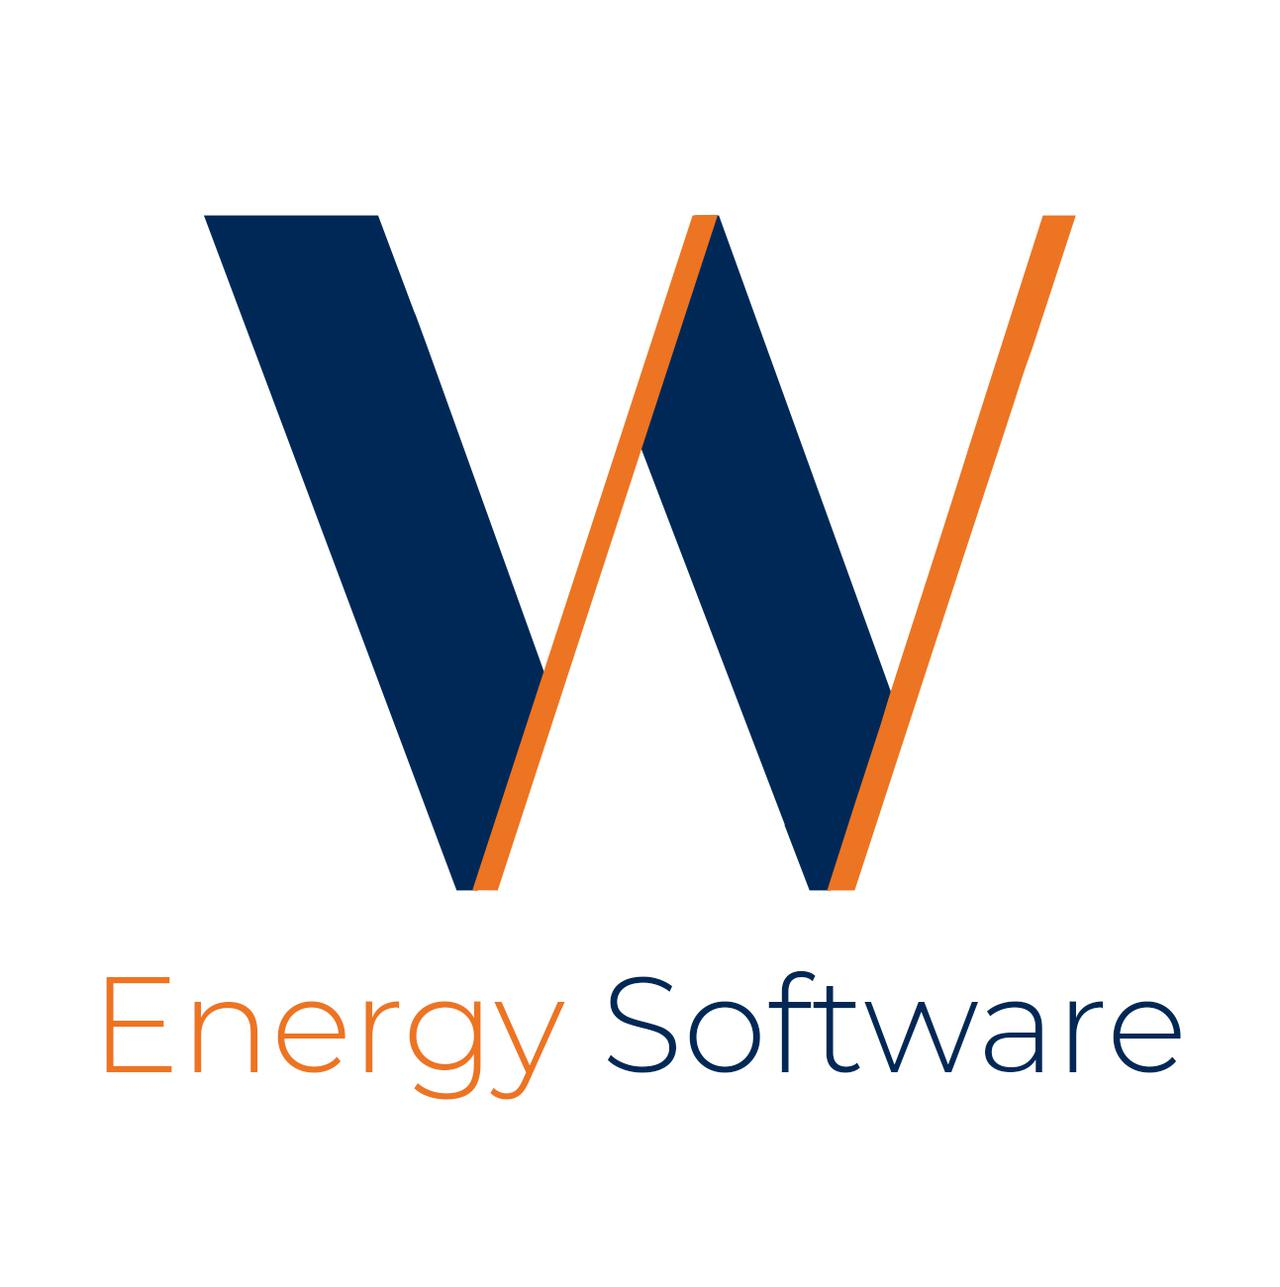 w_energy_logo_concept_final.jpg